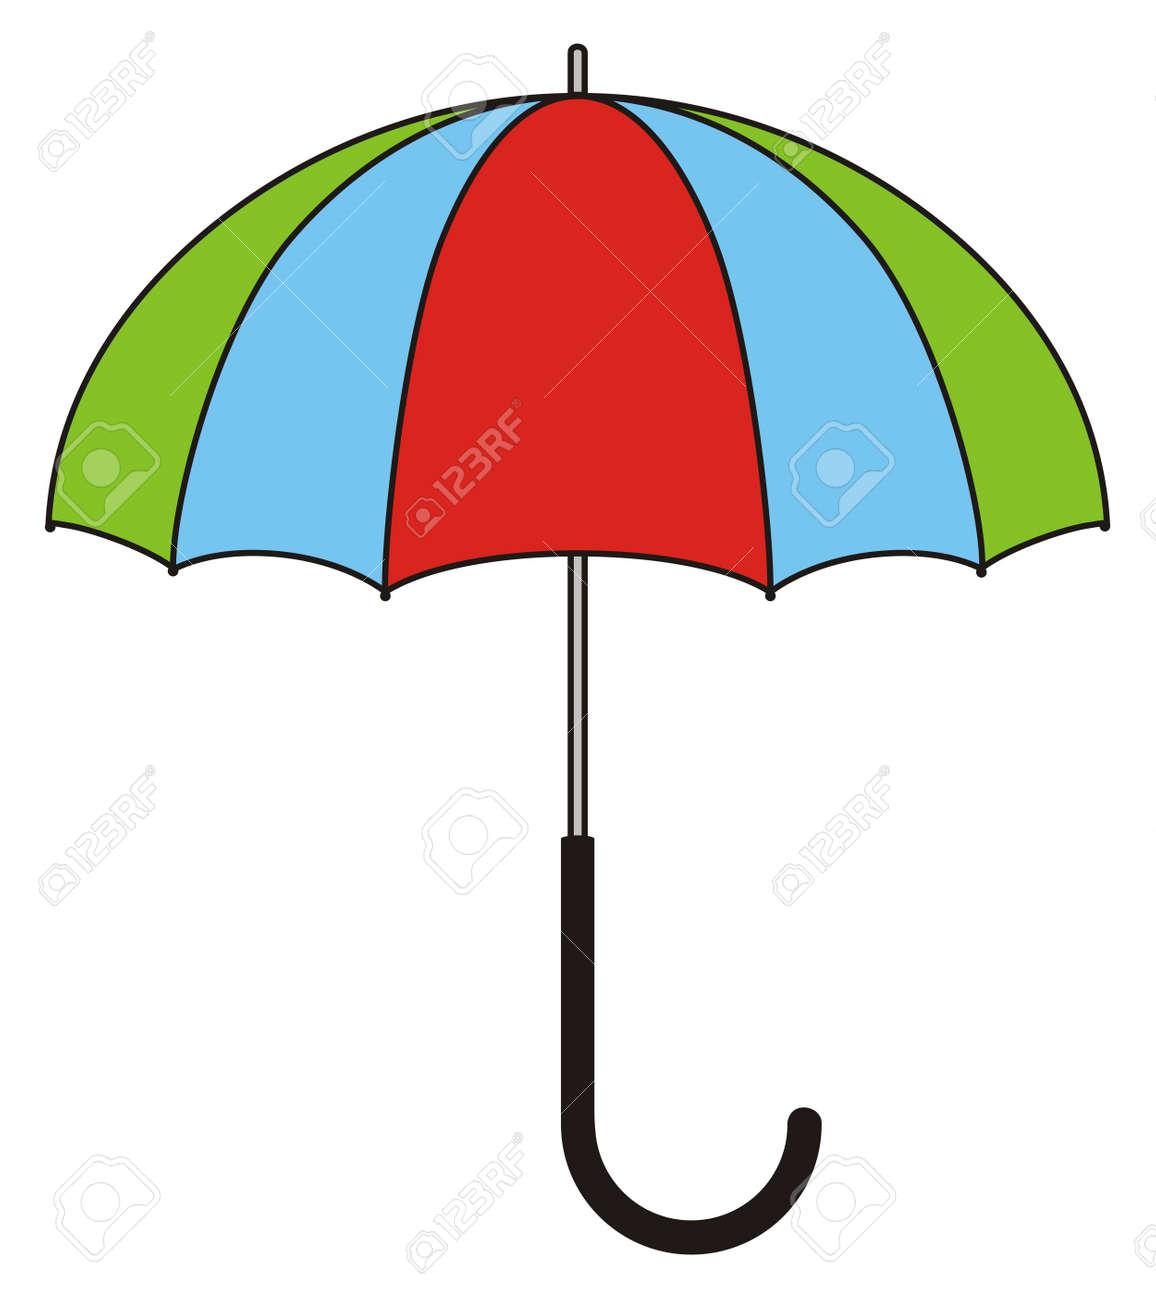 Children's illustration - colorful umbrella Stock Vector - 16194493